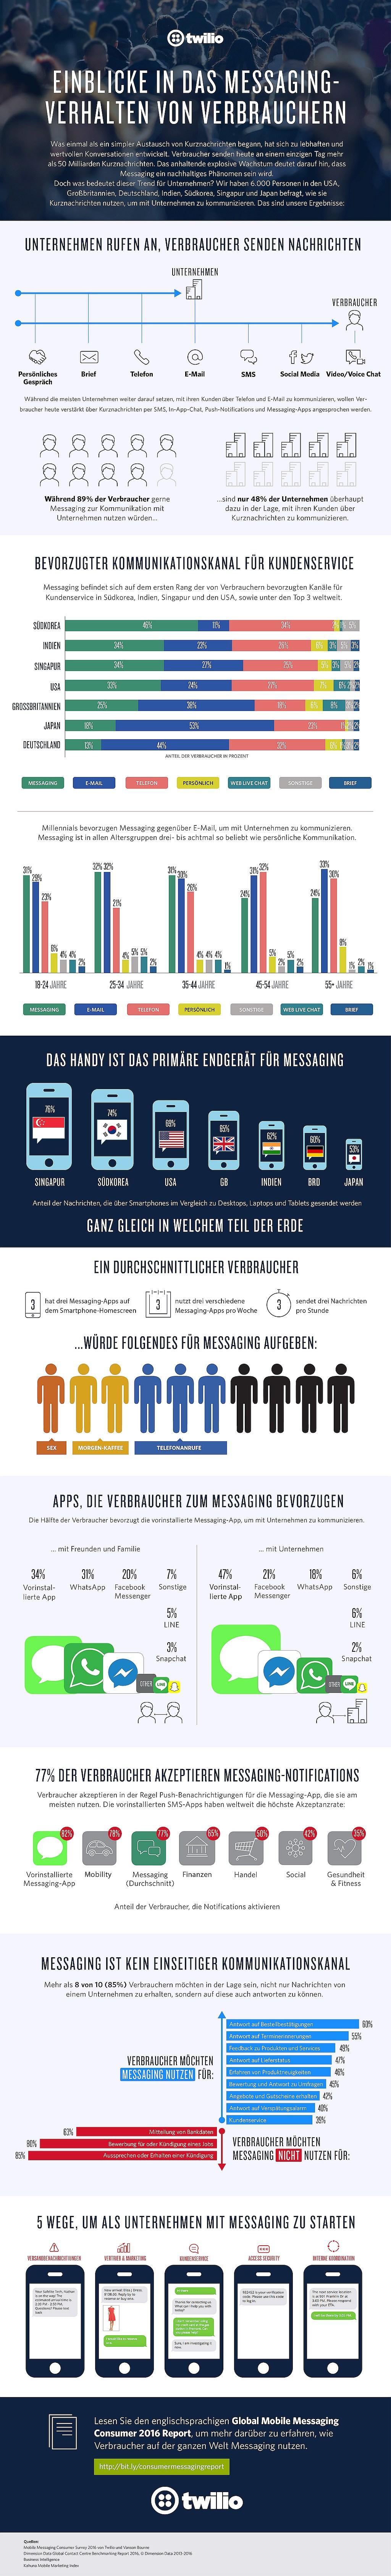 infografik-twilio_mobile_messaging_de-w